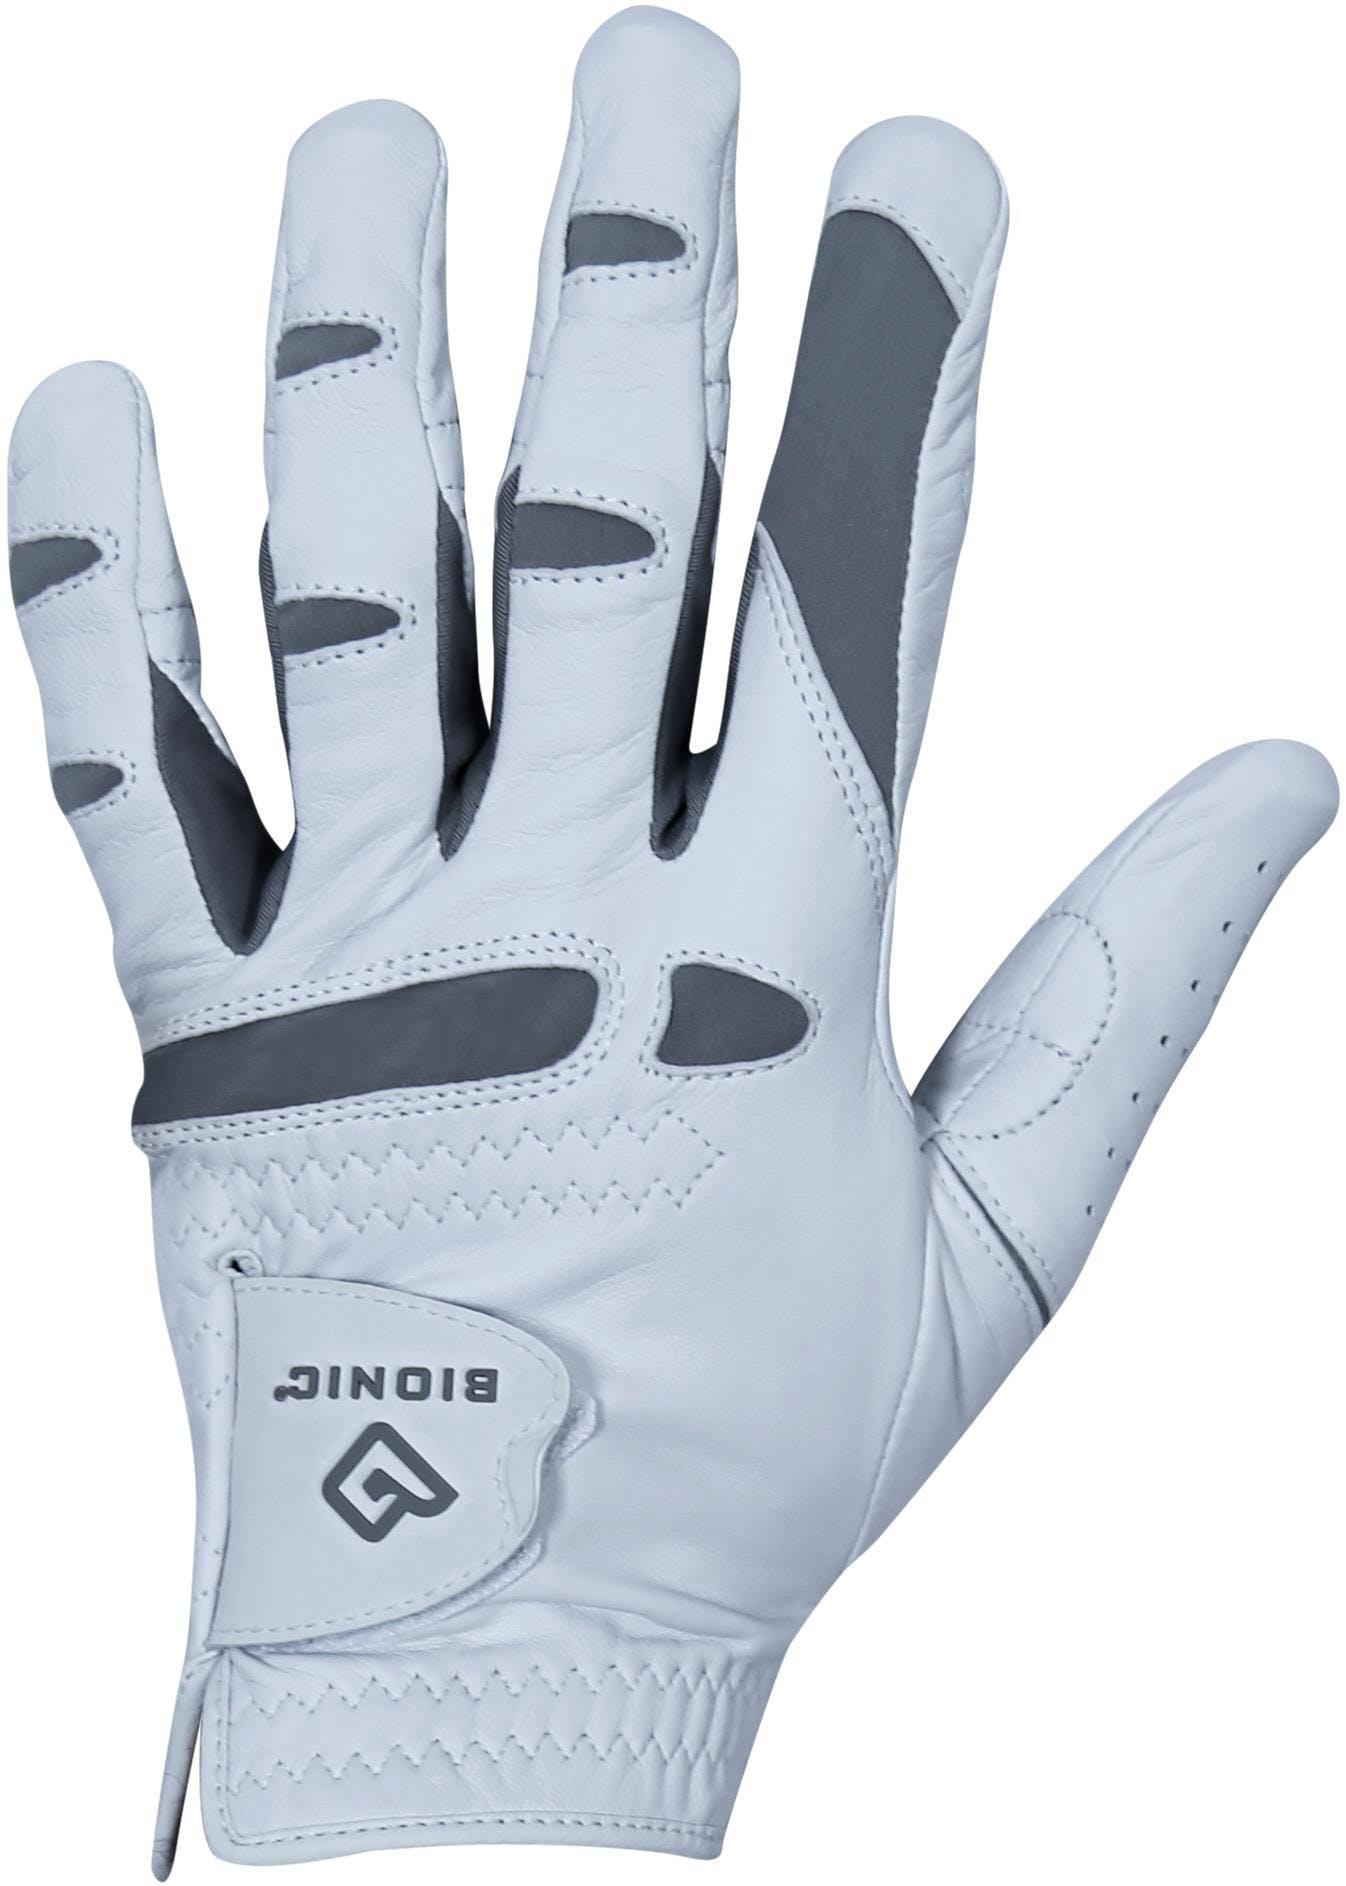 Bionic Men's PerformanceGrip Pro Left Hand White Golf Glove